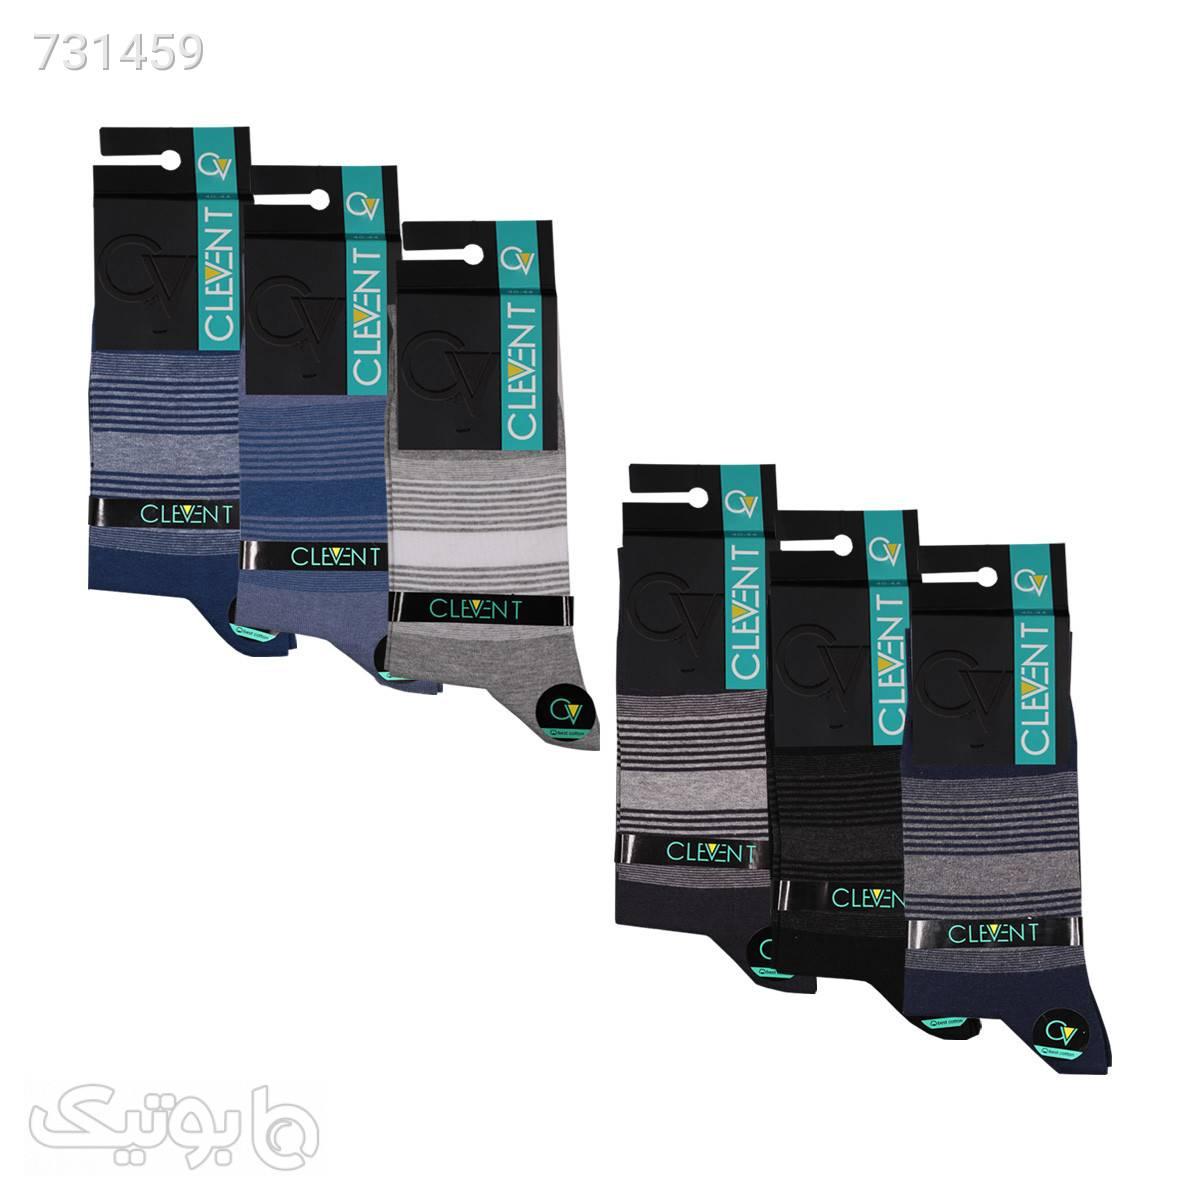 جوراب مردانه ۱۱۰۲ ساق دار بسته ۶ عددی برند CLEVENT کدsom1021 آبی جوراب و پاپوش